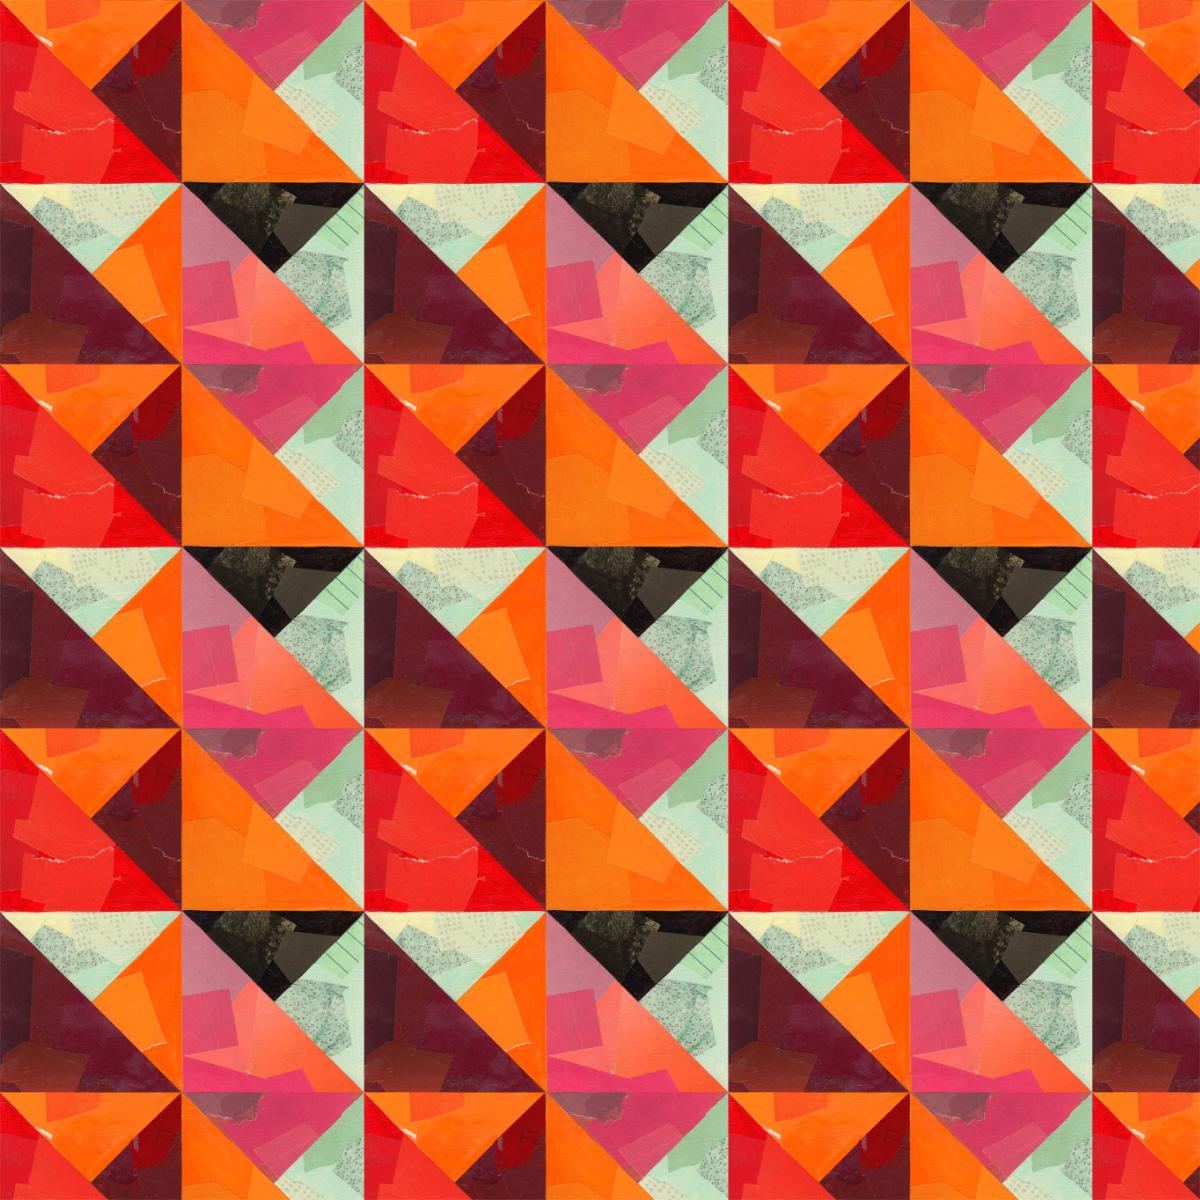 TrianglePattern_site_2.jpg